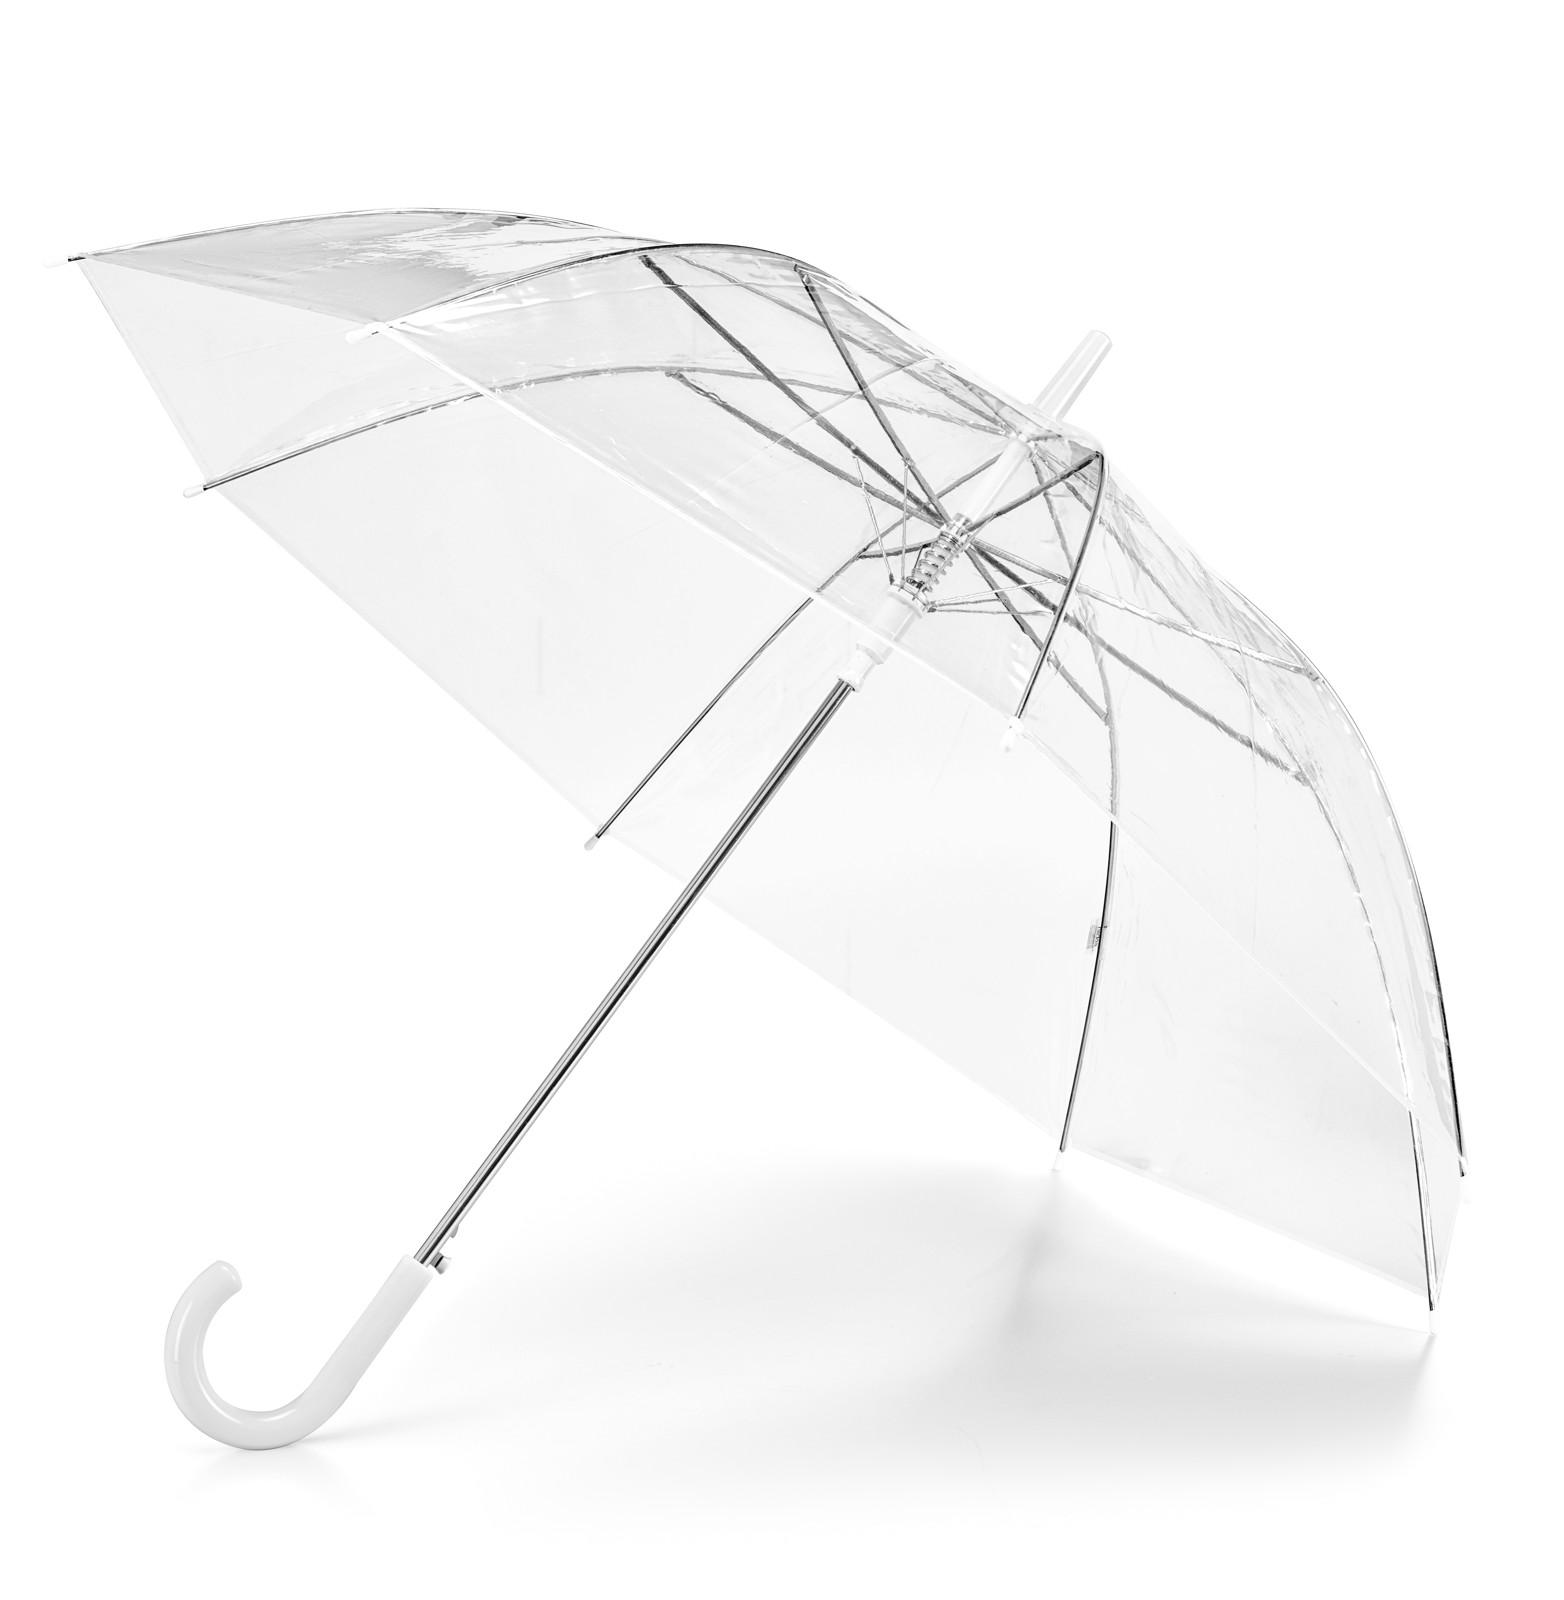 NICHOLAS. Ομπρέλα με αυτόματο άνοιγμα